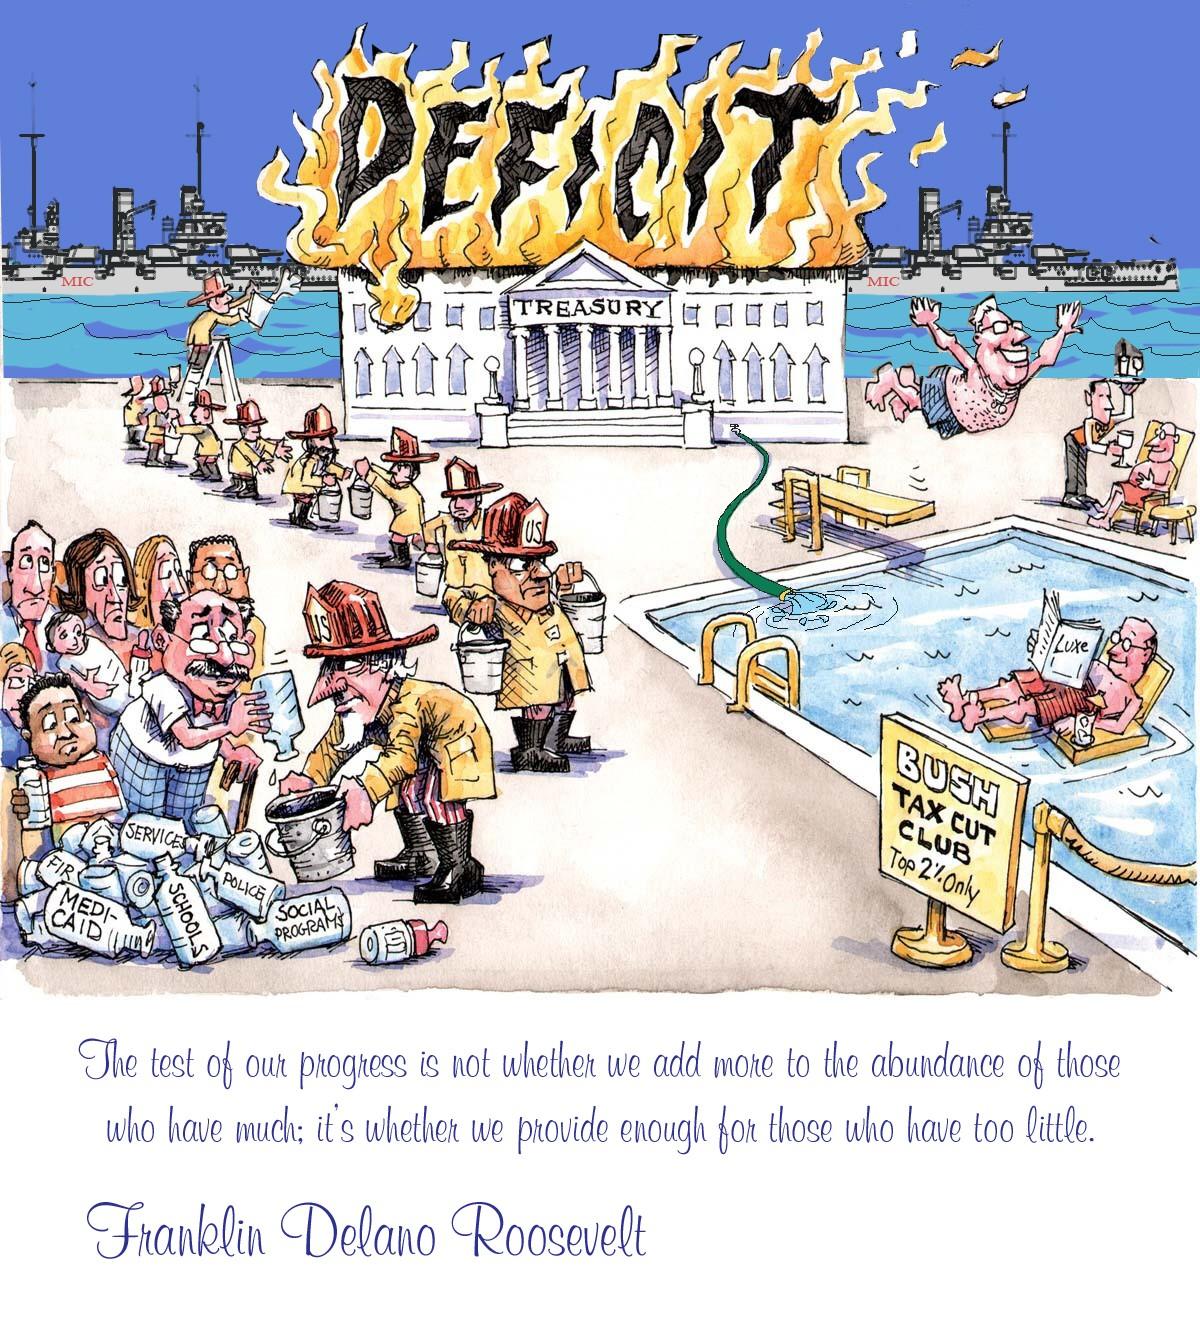 00 Political Cartoon. 08.12. Deficit. FDR quote